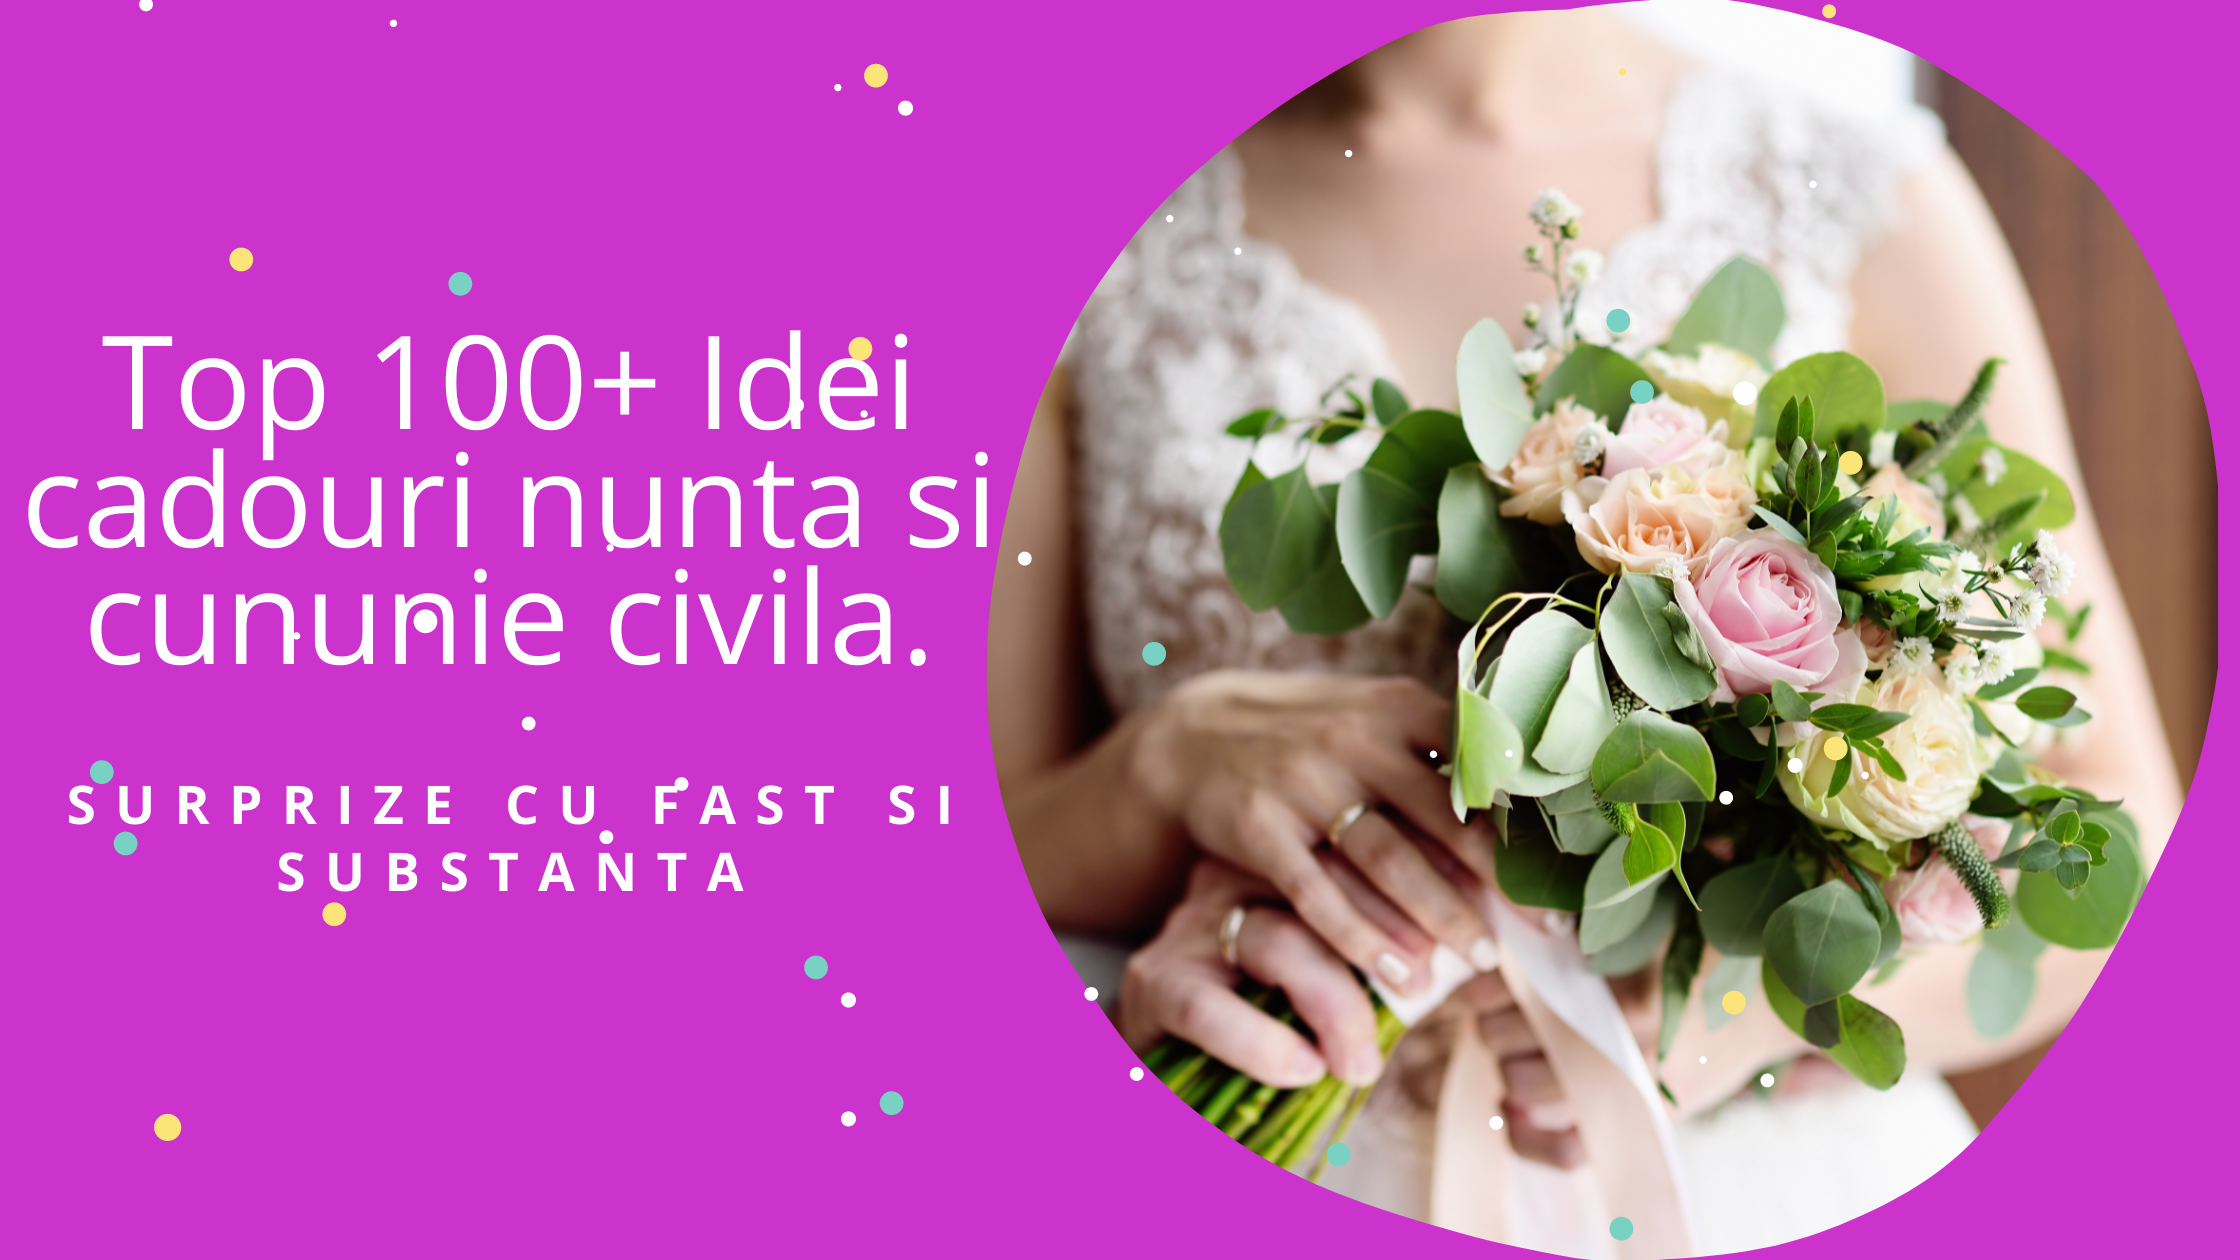 Top 100+ Idei cadouri nunta si cununie civila. Surprize cu Fast si Substanta